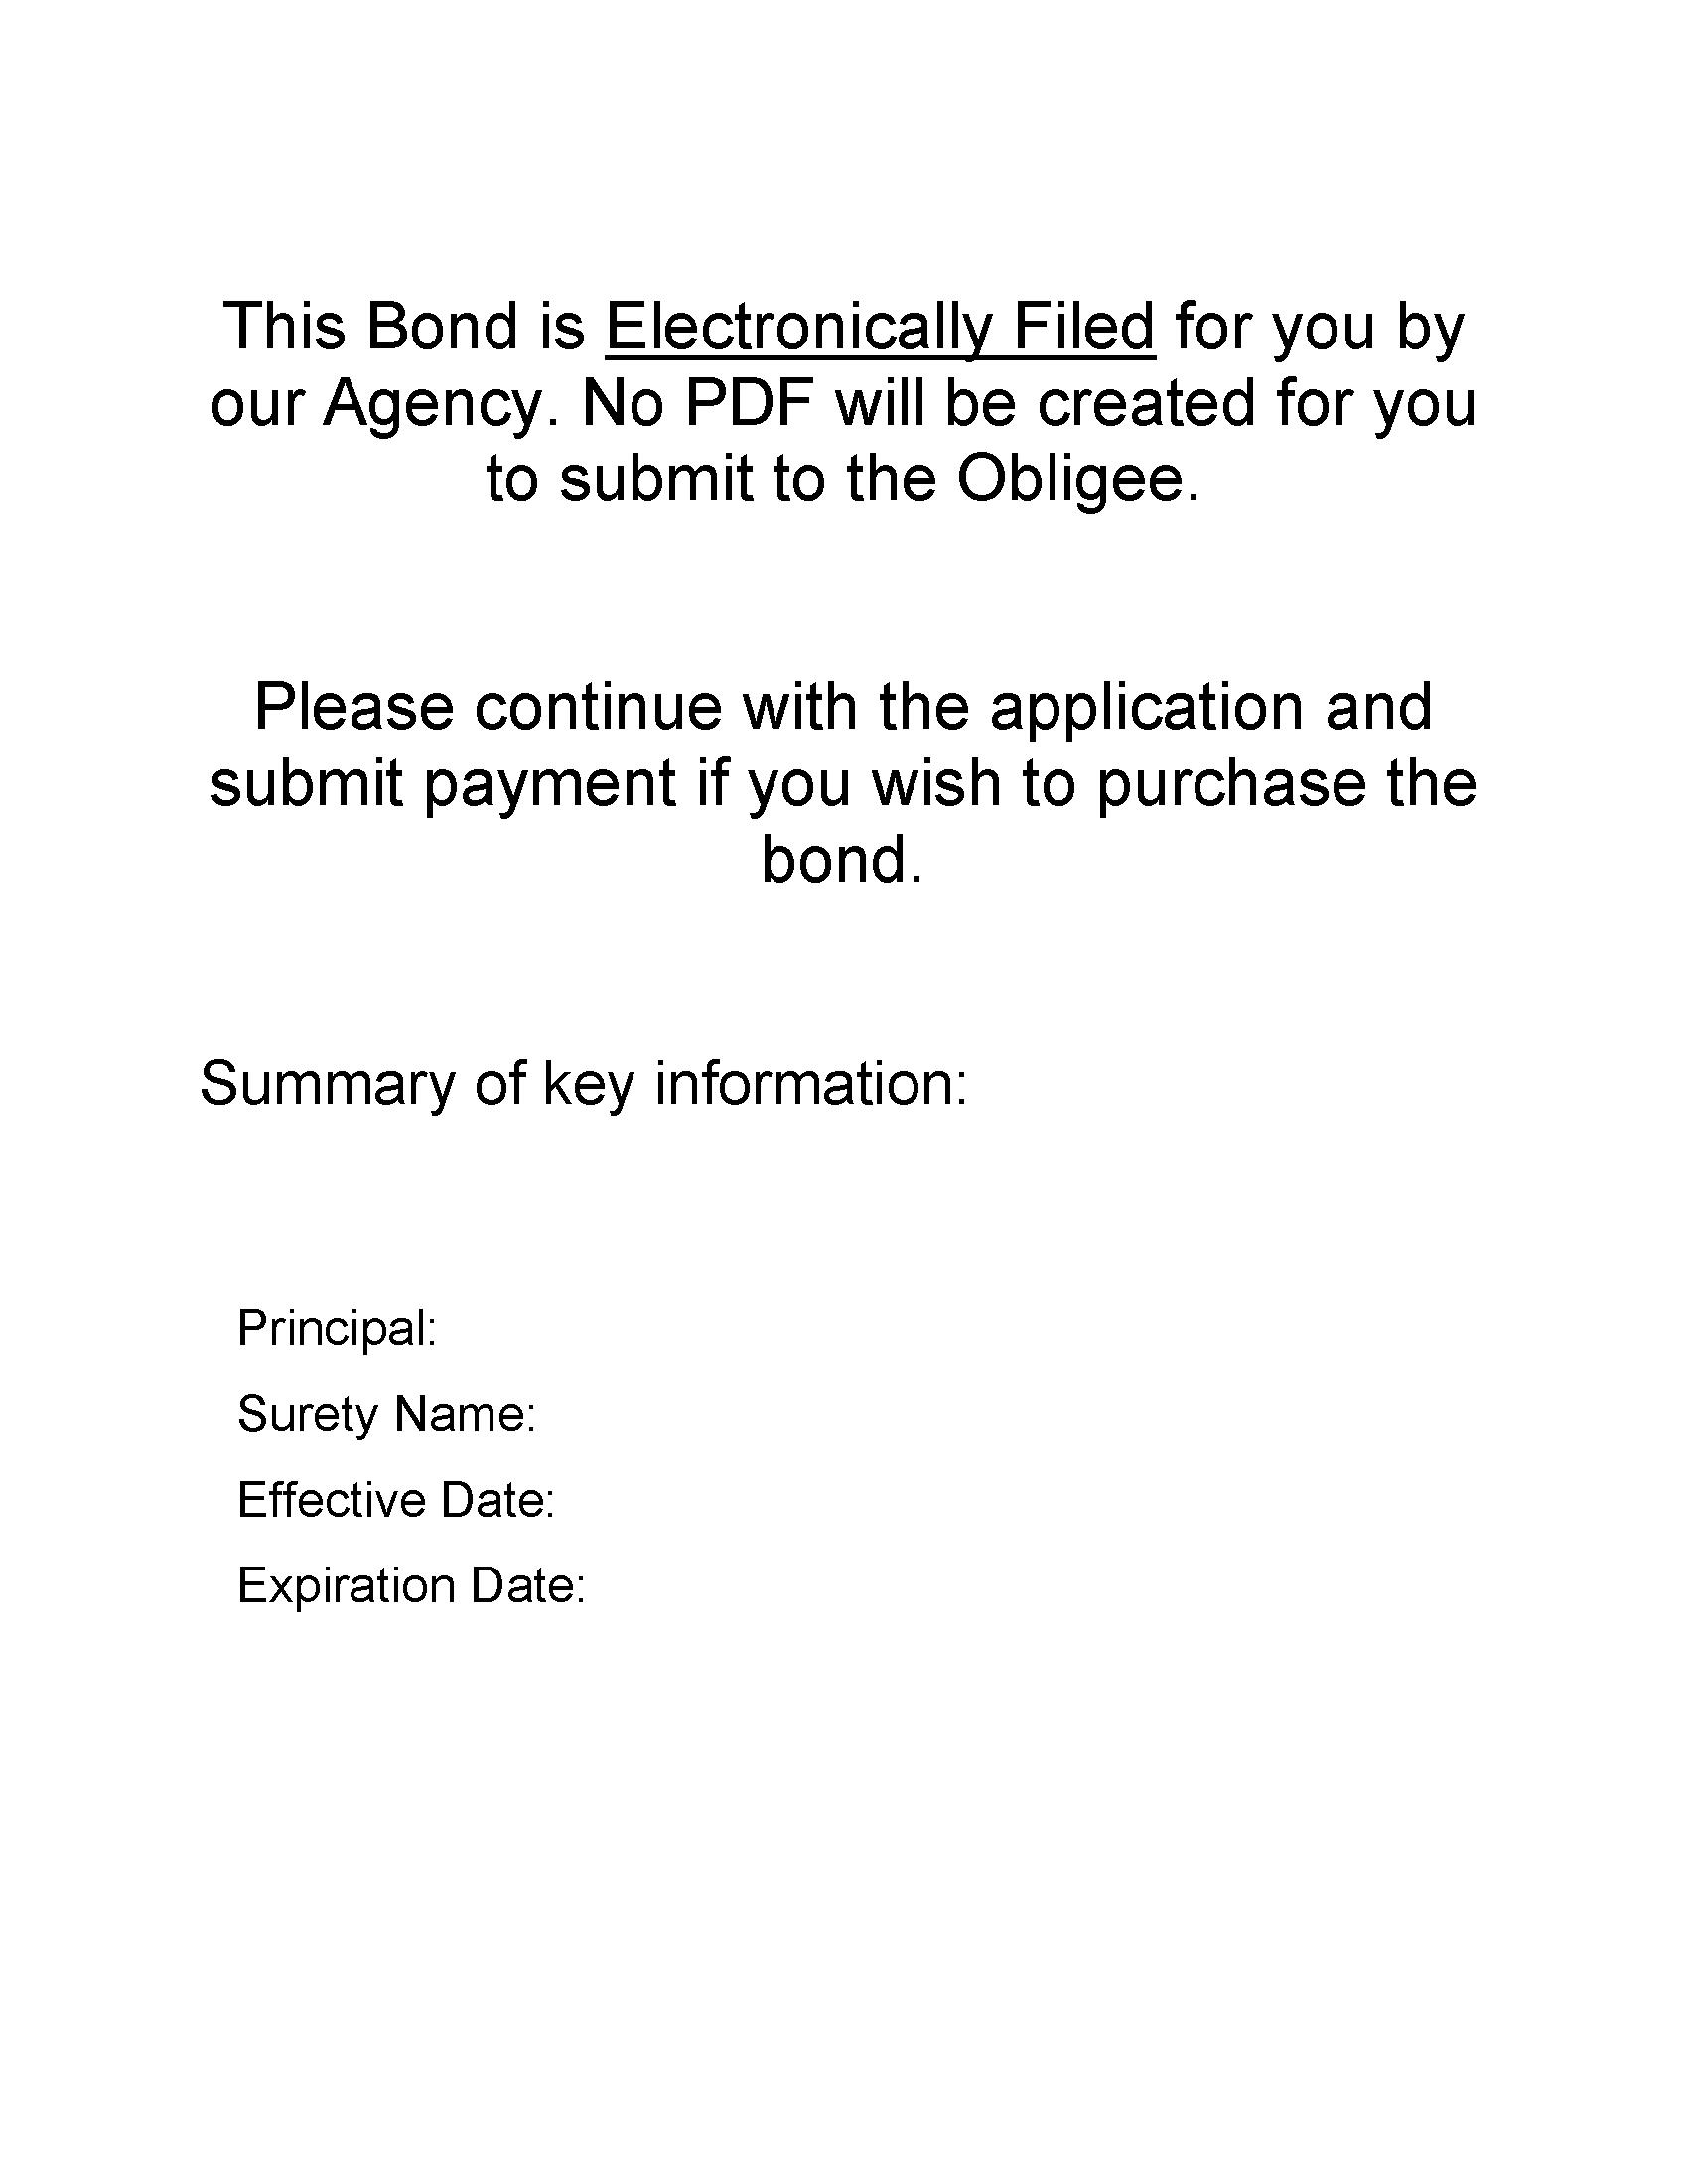 Commonwealth of Kentucky Mortgage Loan Company sample image